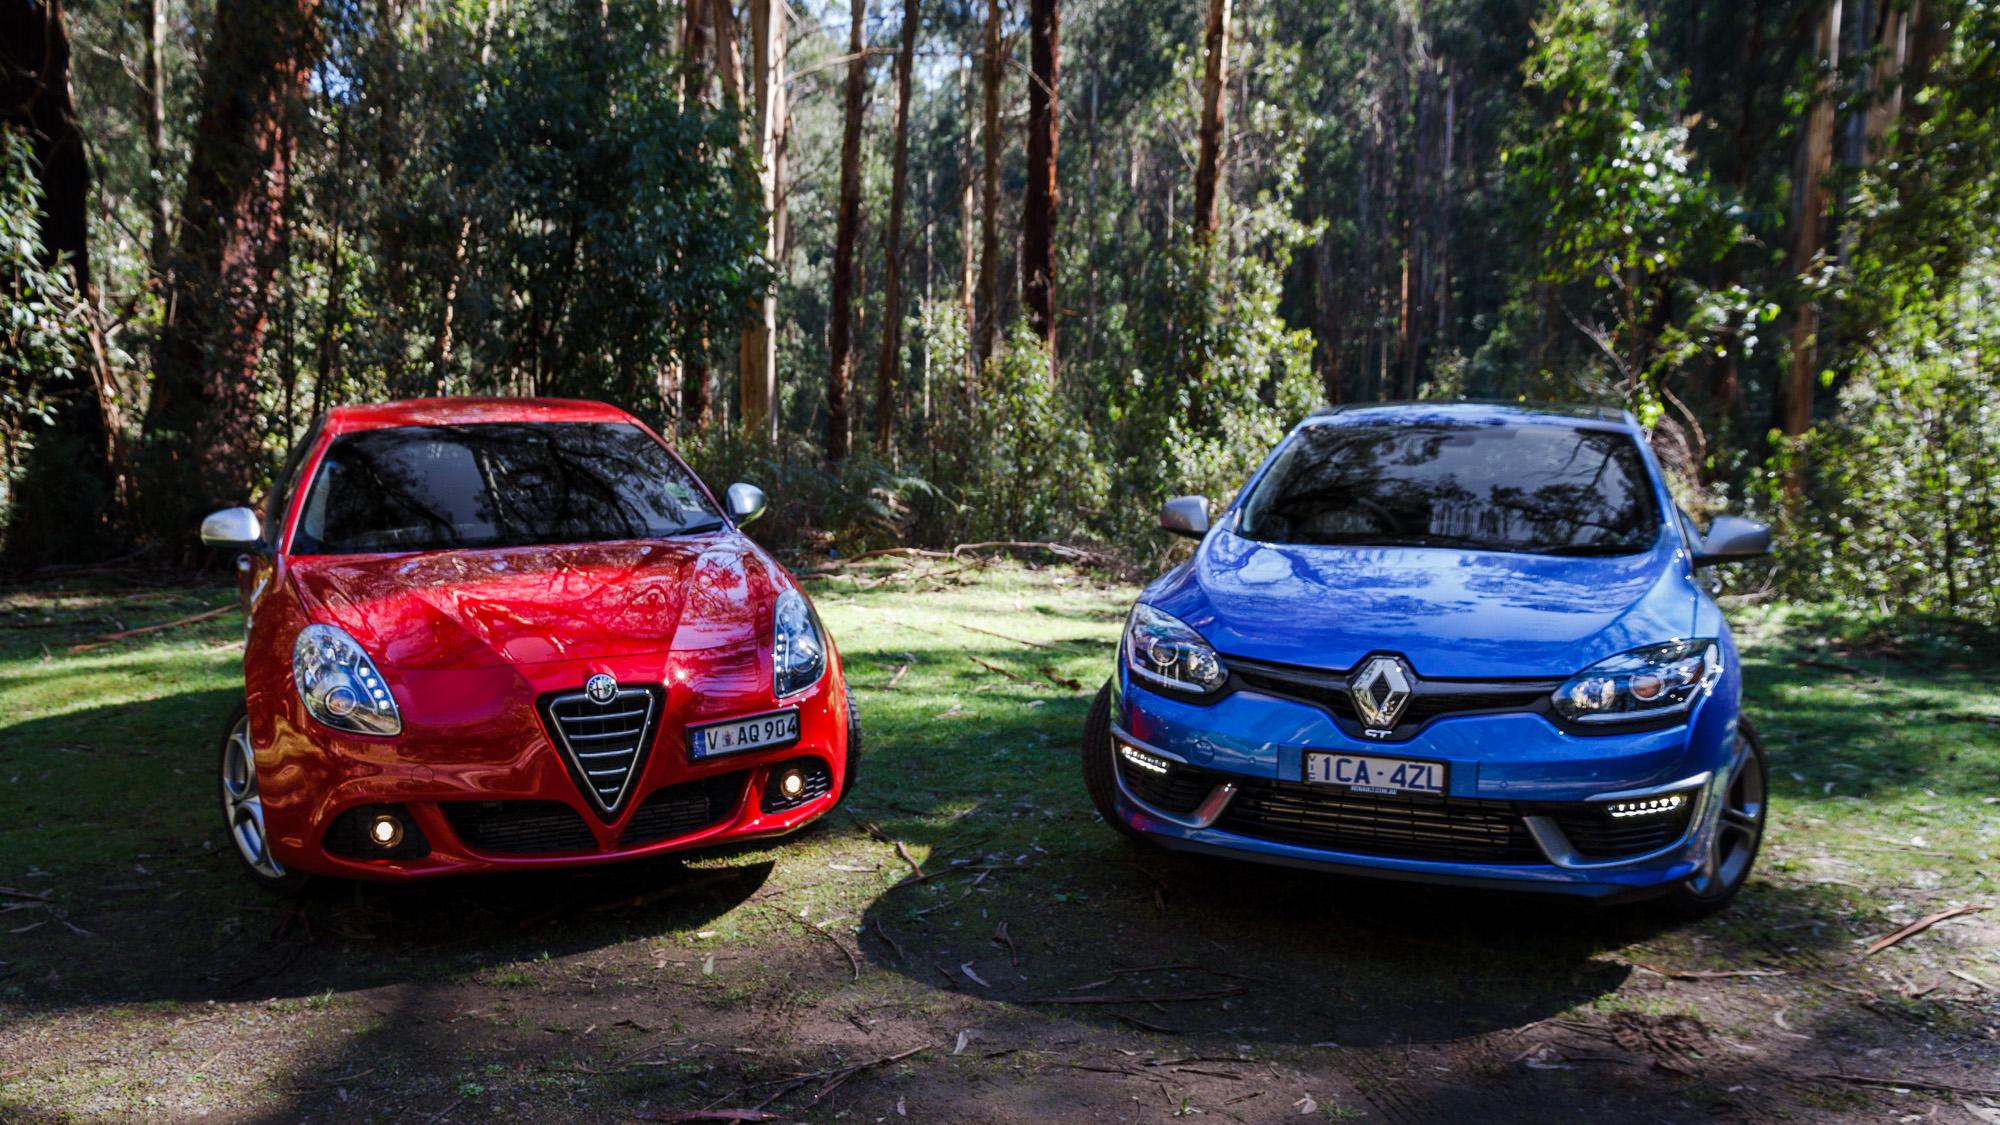 Renault Megane Gt 220 V Alfa Romeo Giulietta Qv Comparison Review Caradvice